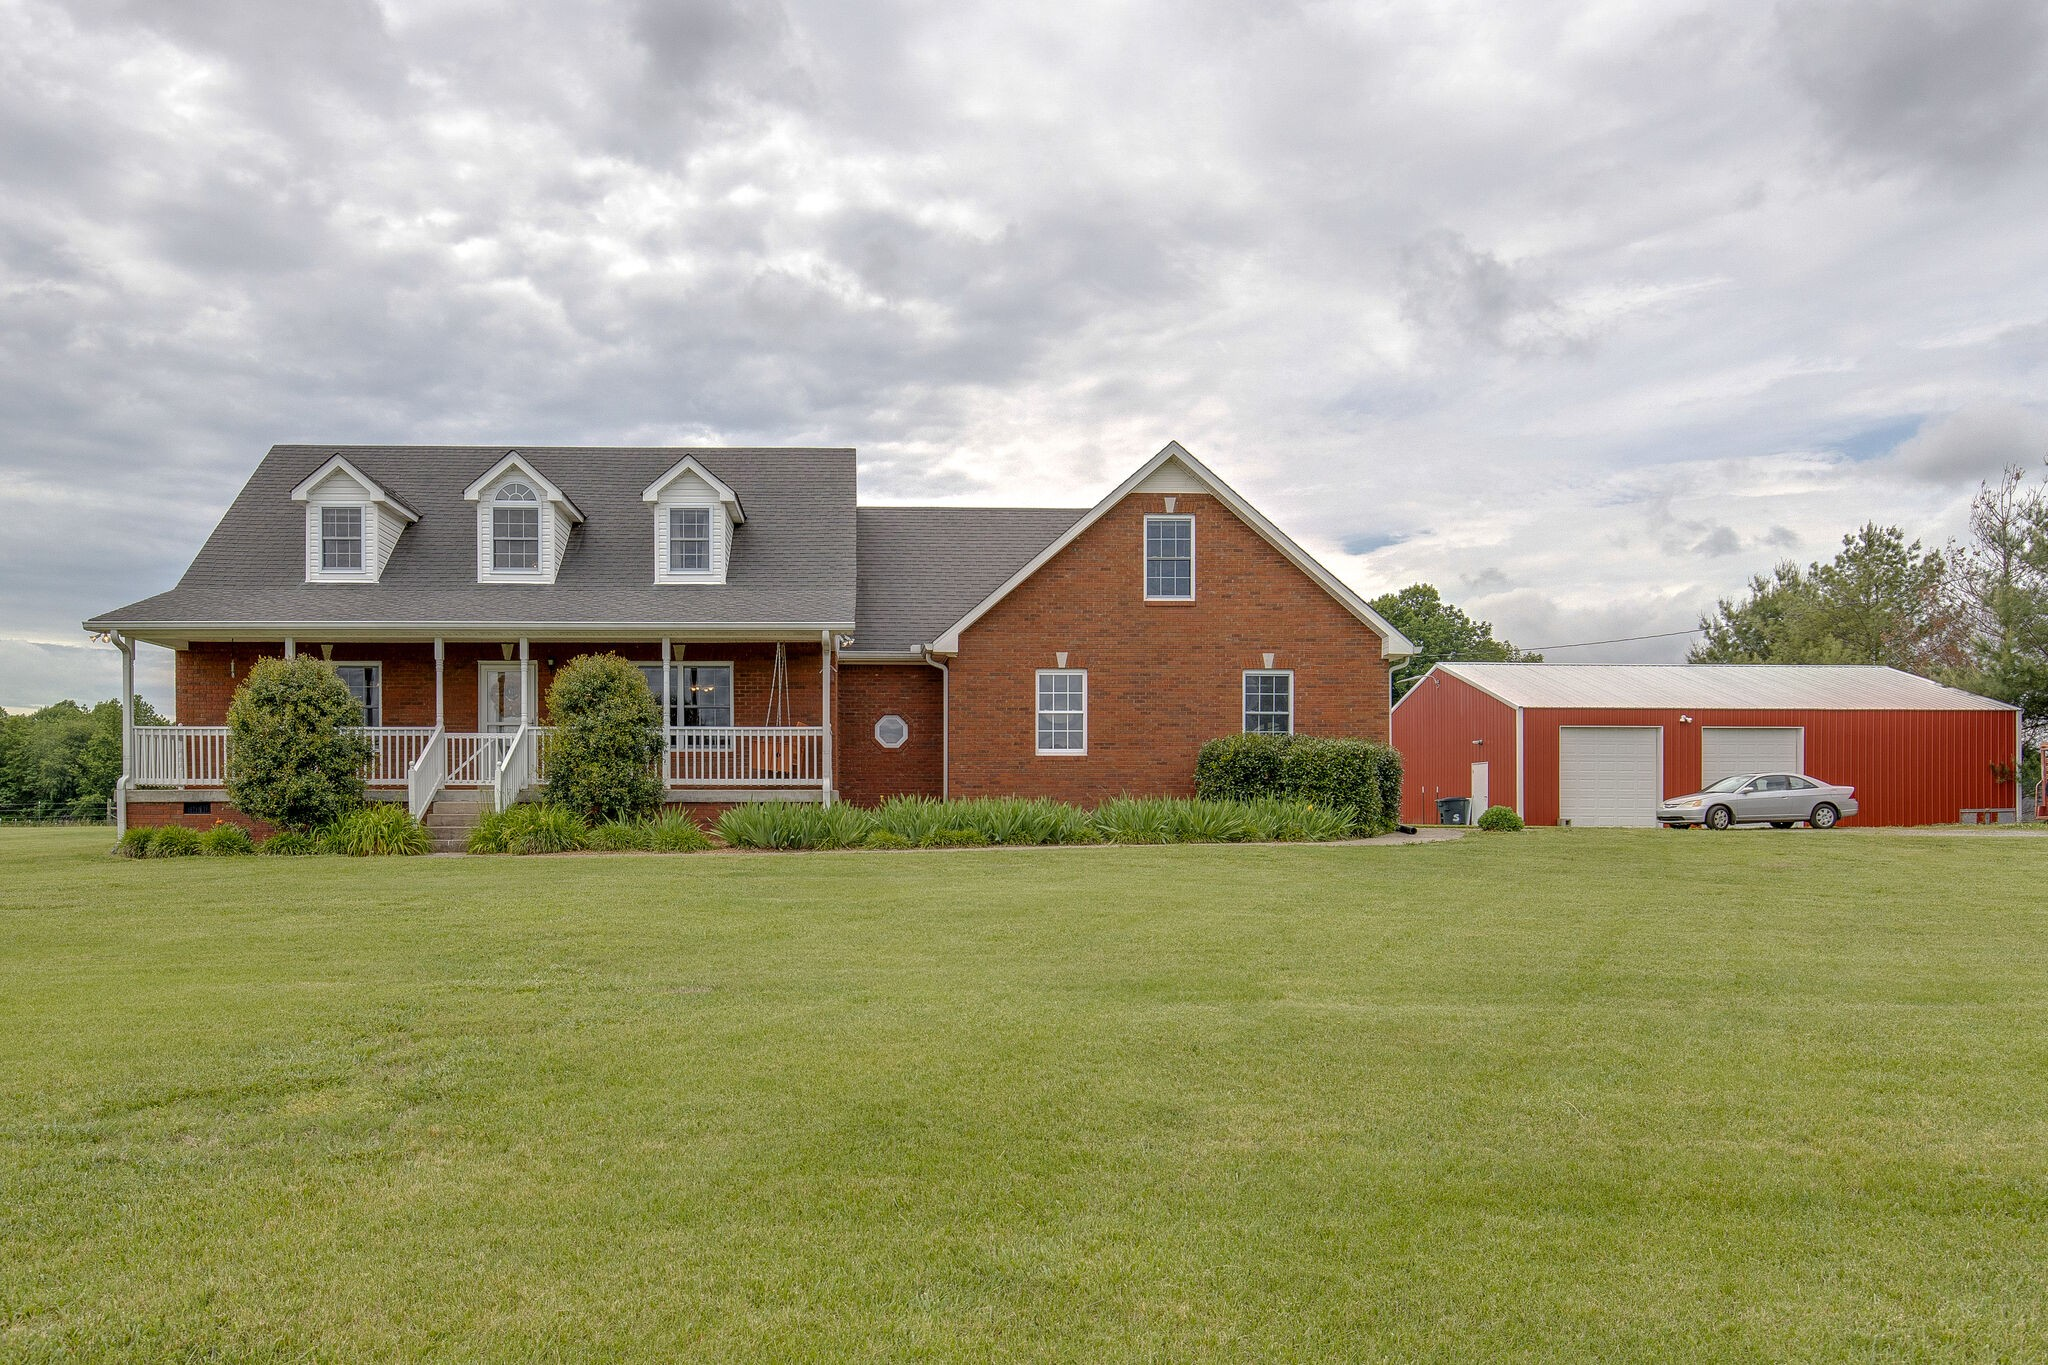 3763 Thomasville Rd, Chapmansboro, TN 37035 - Chapmansboro, TN real estate listing